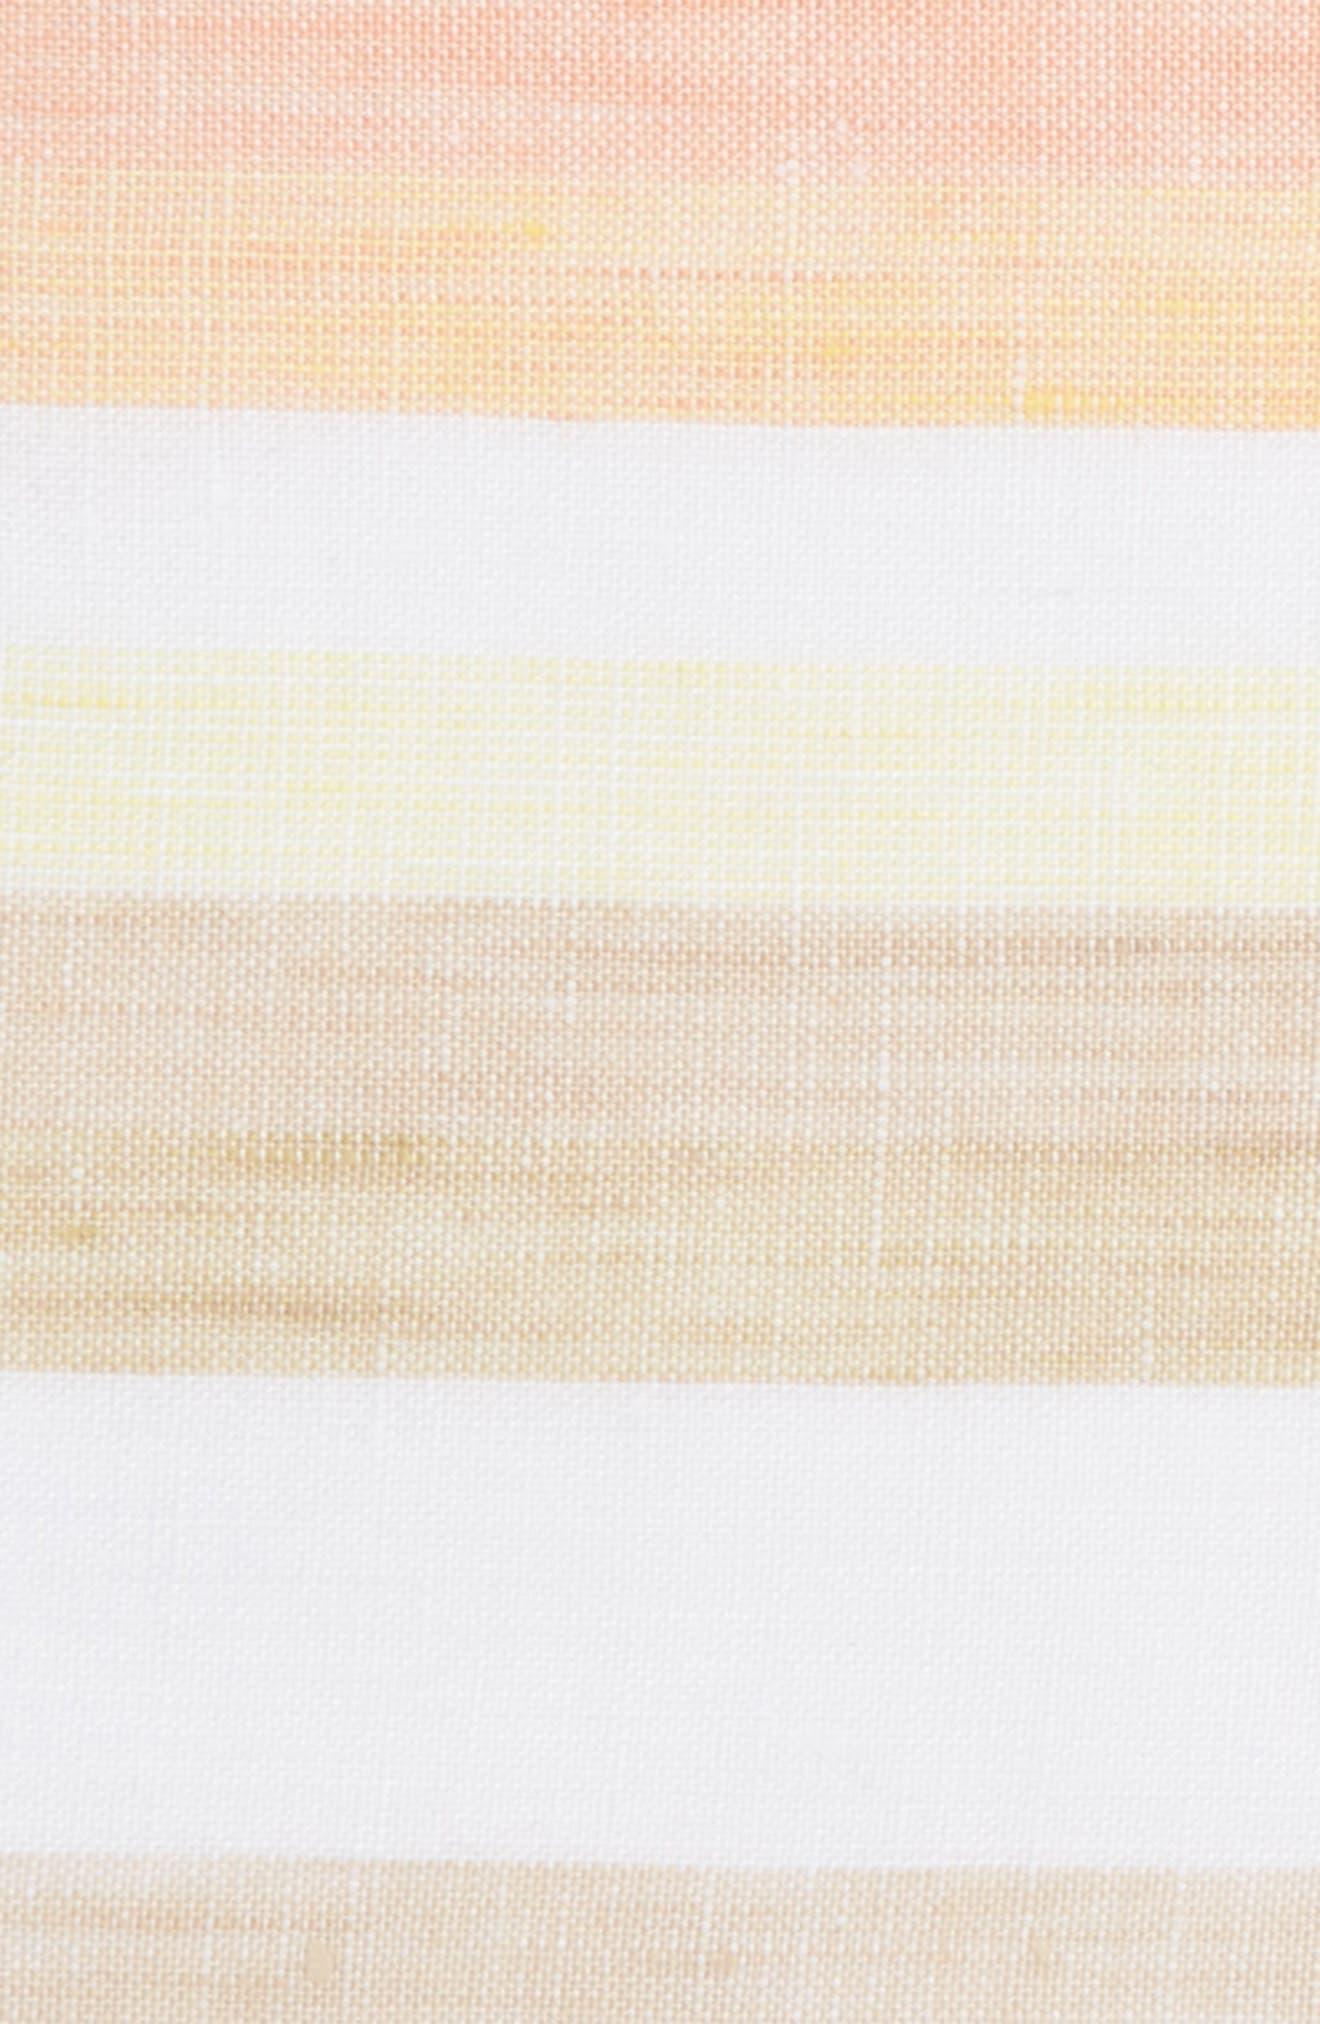 Peach Cake Linen Pocket Square,                             Alternate thumbnail 3, color,                             800